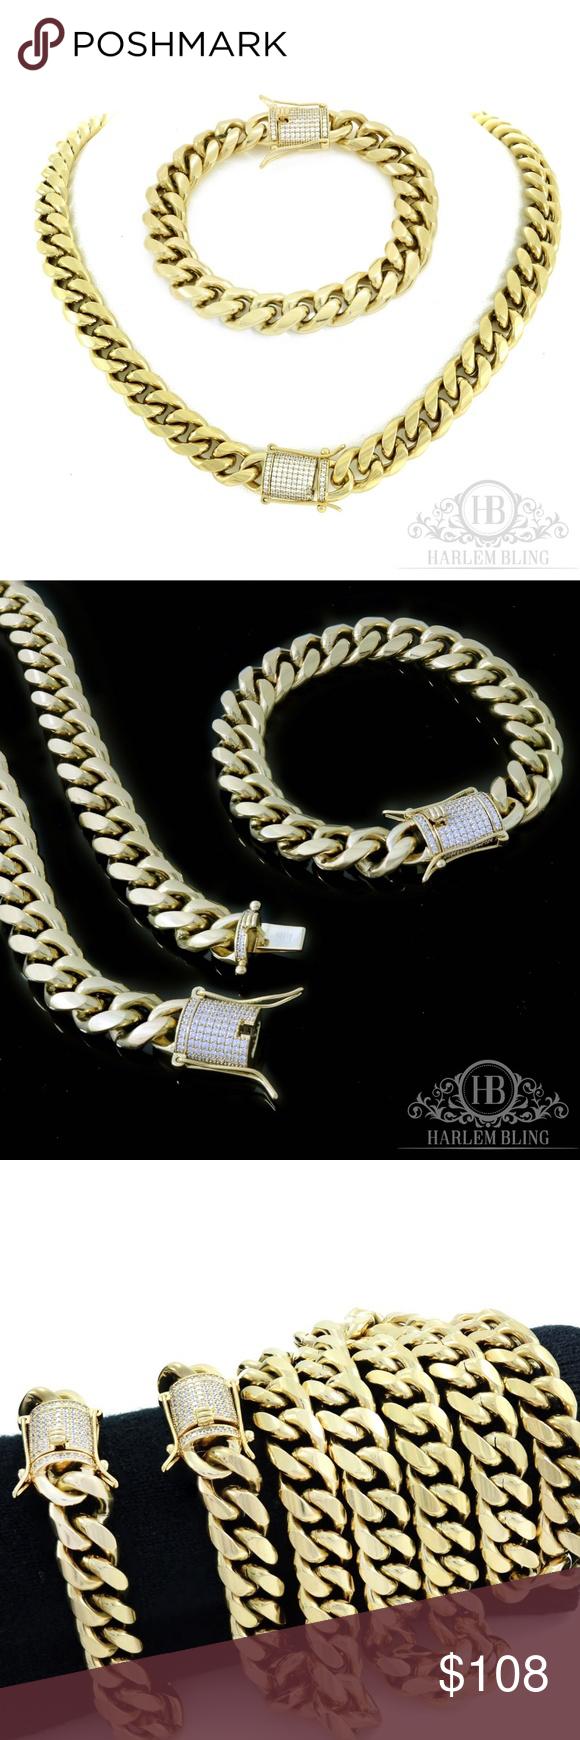 Mens cuban miami link bracelet u chain set nwt my posh picks